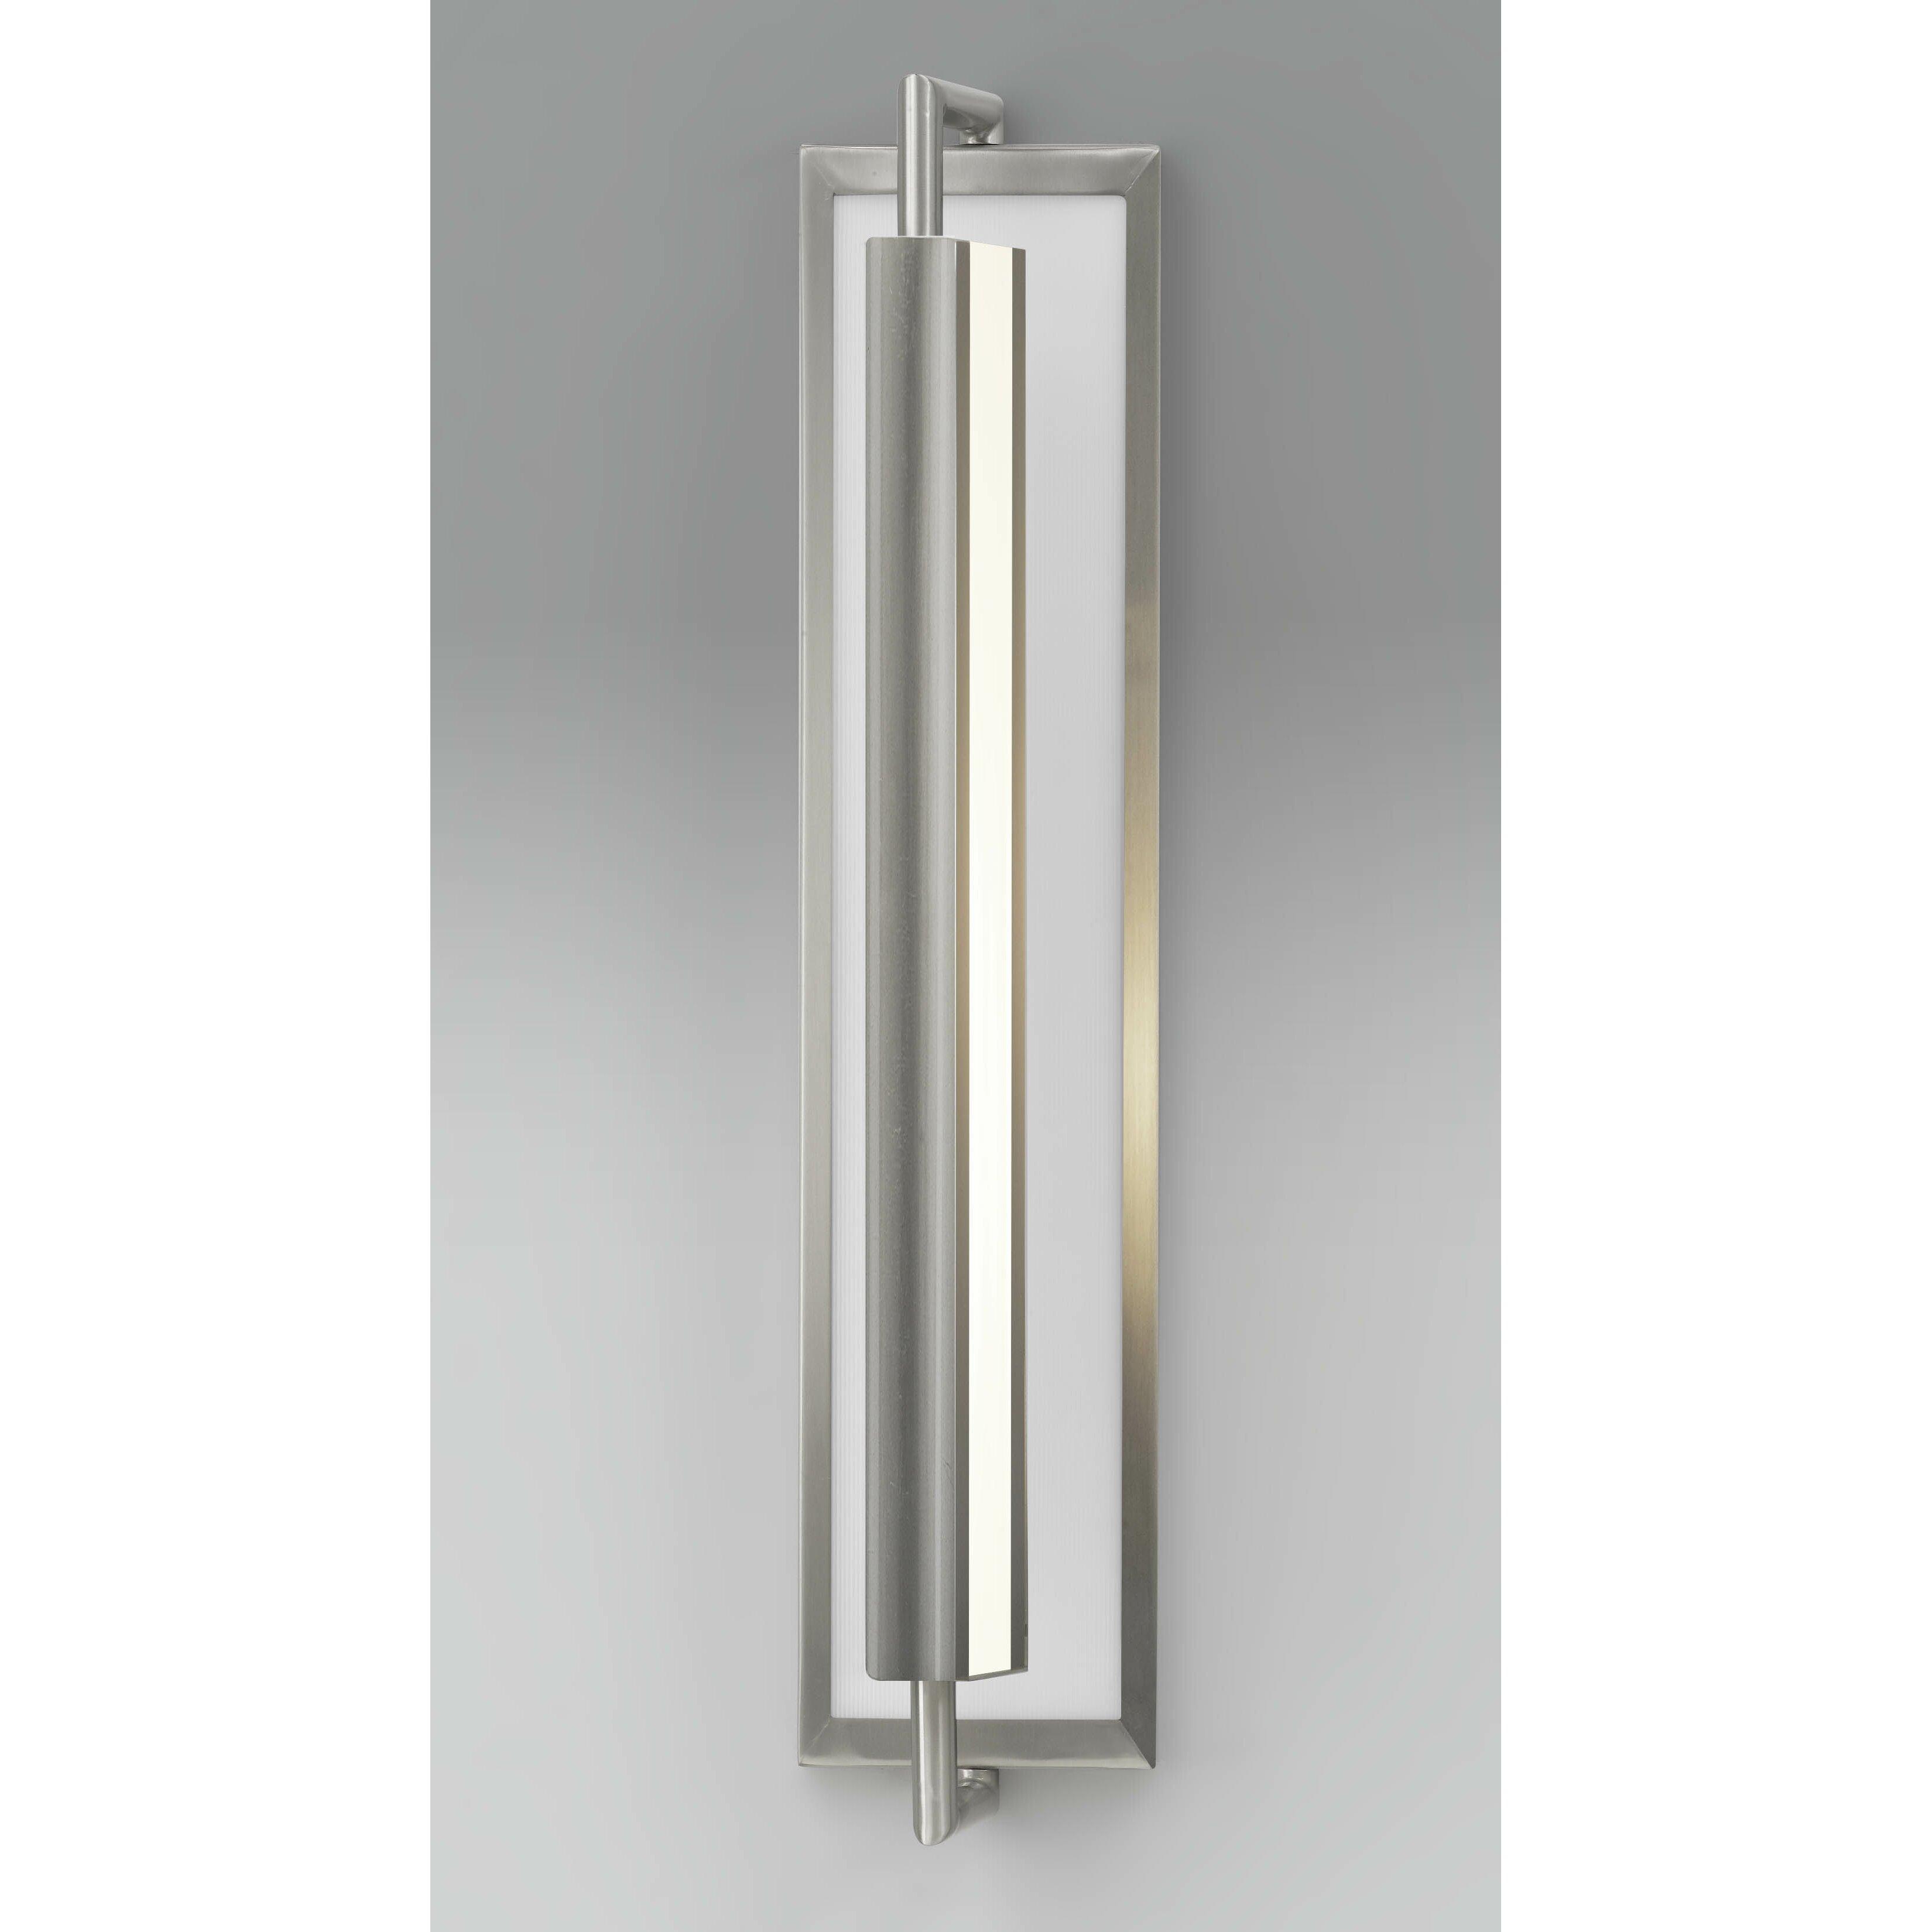 Feiss Bathroom Wall Sconces : Feiss Mila 2 Light Wall Sconce & Reviews Wayfair.ca